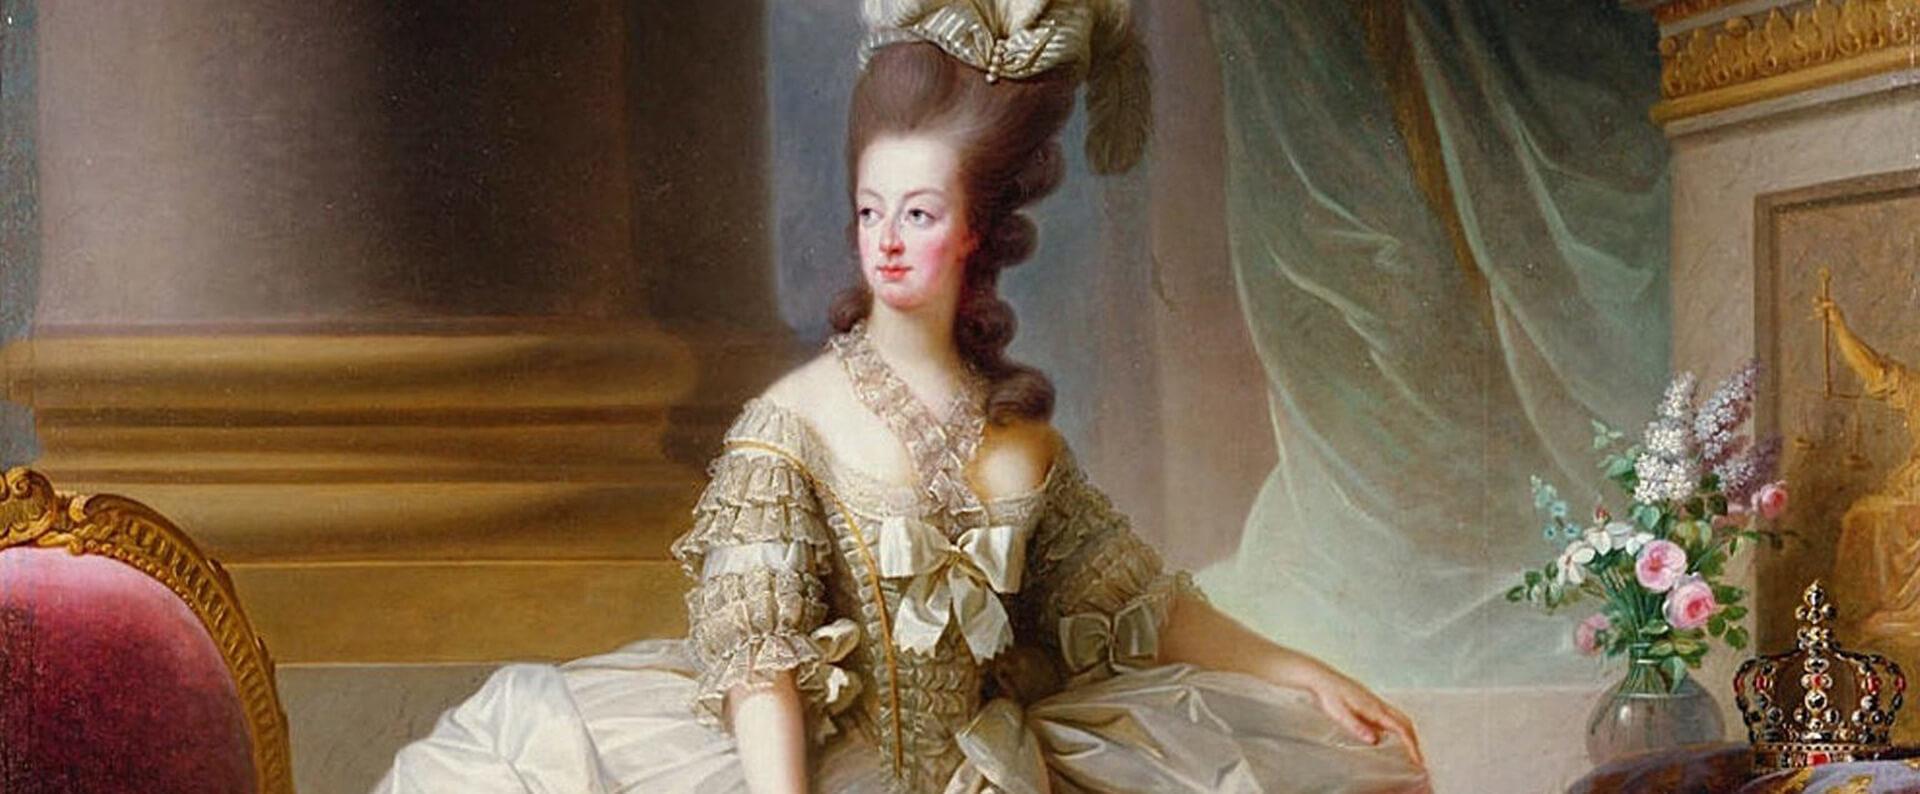 Królowa Maria Antonina